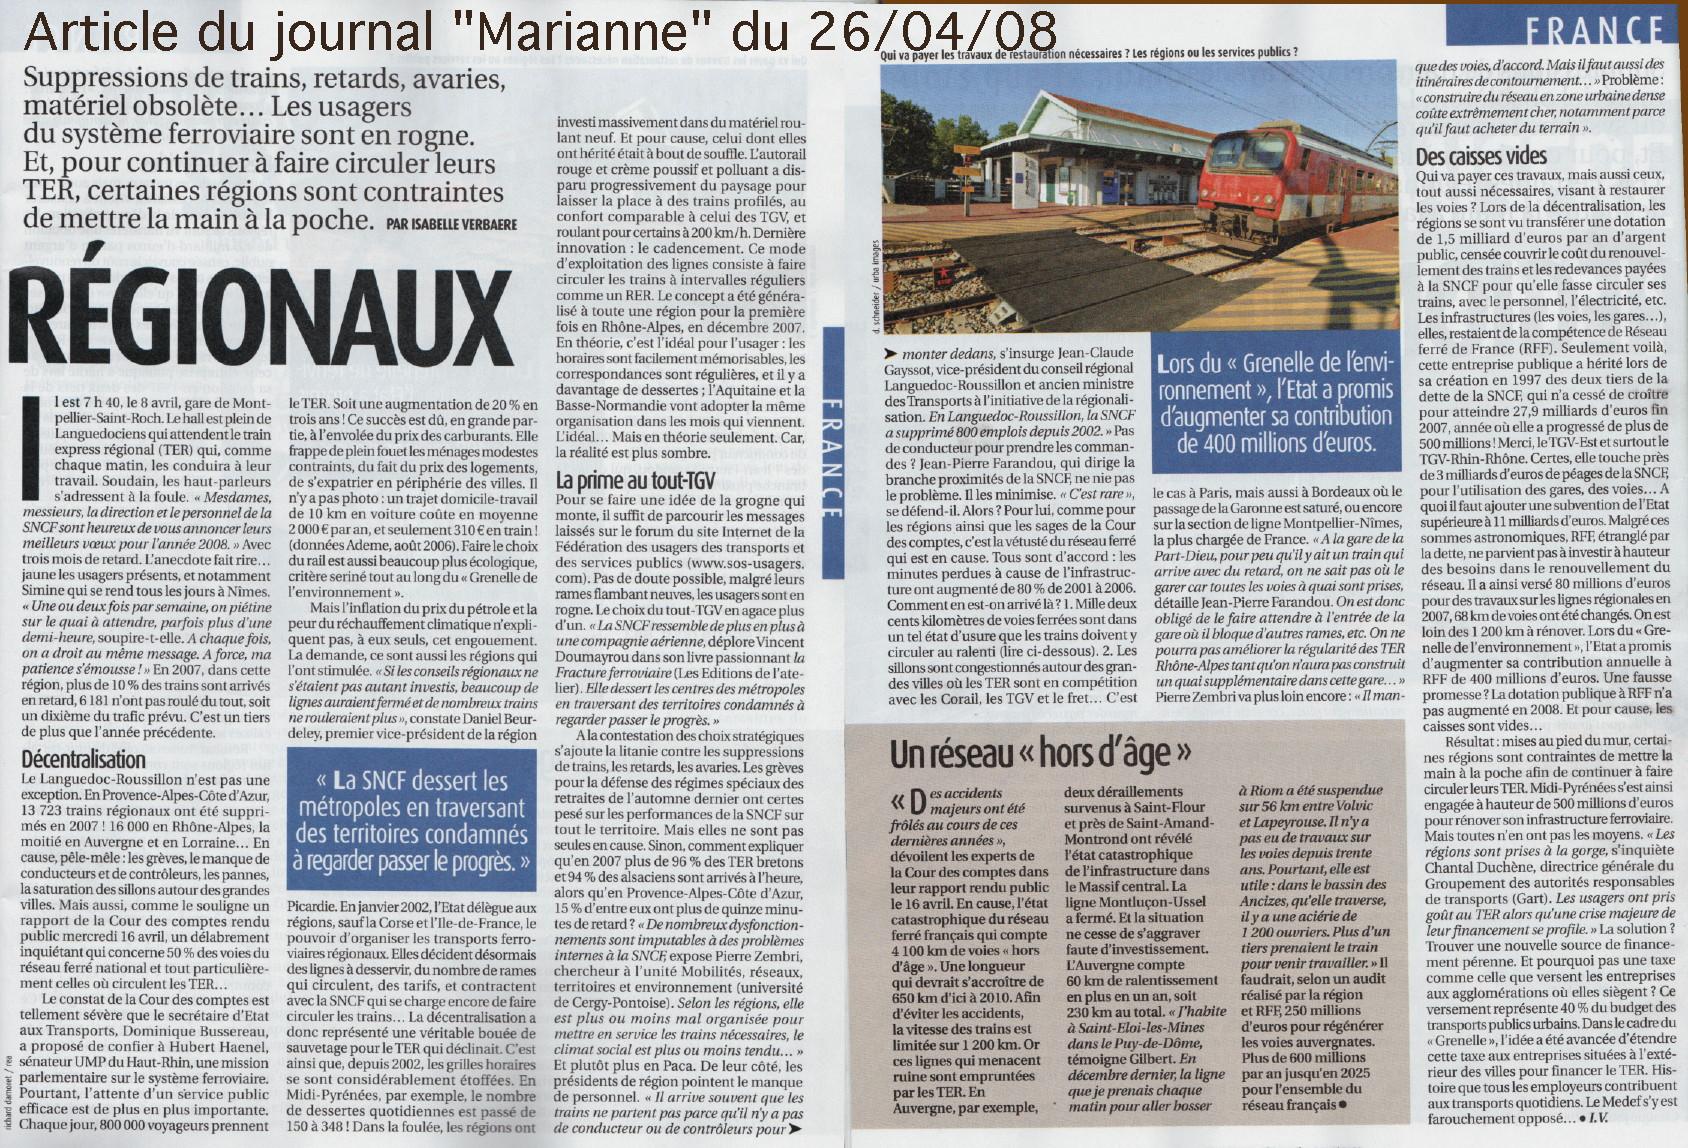 Mai 2008 futsp - Journal marianne adresse ...